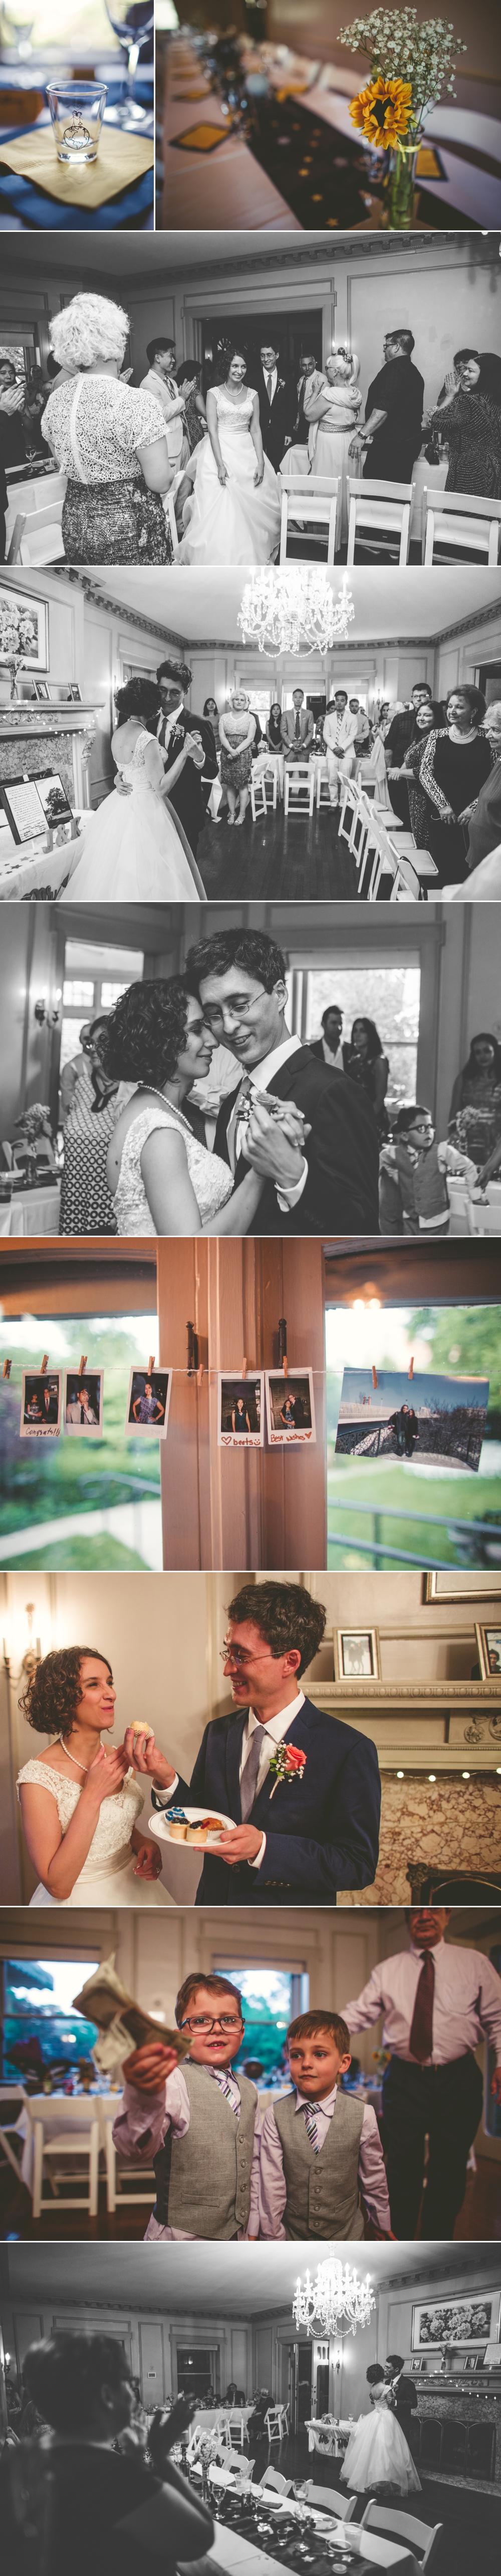 jason_domingues_photography_best_kansas_city_photographer_kc_weddings_simpson_house_0003.jpg